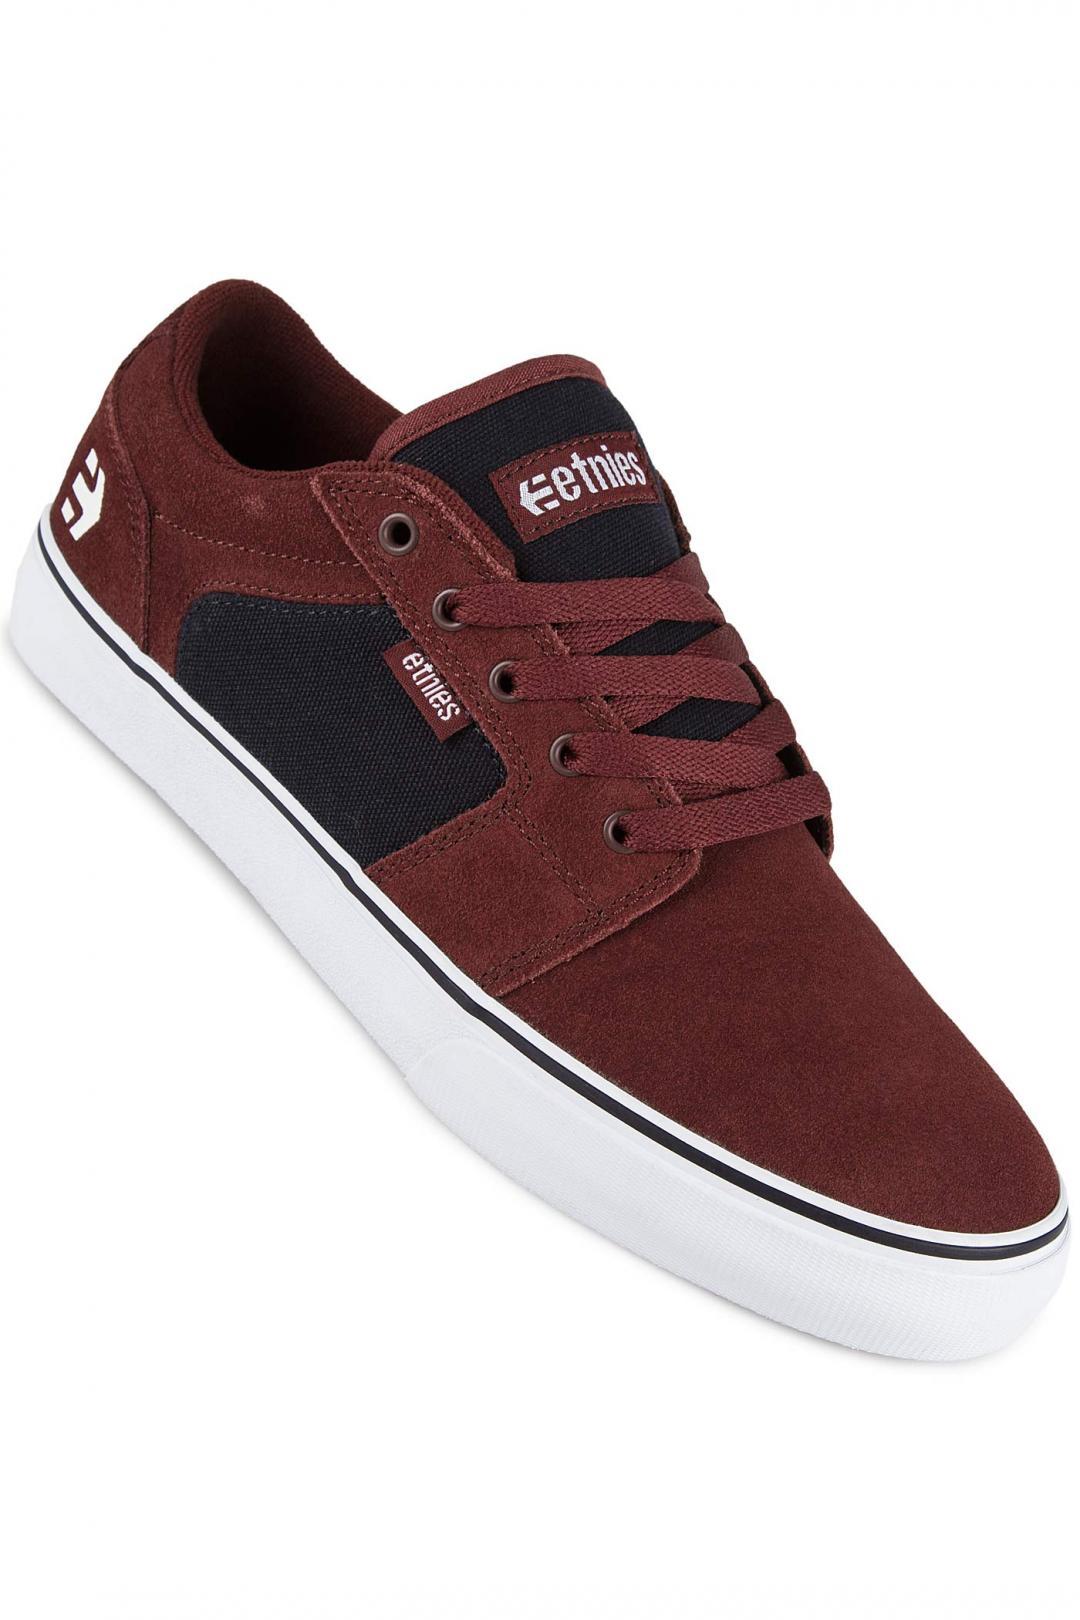 Uomo Etnies Barge LS red navy | Sneaker